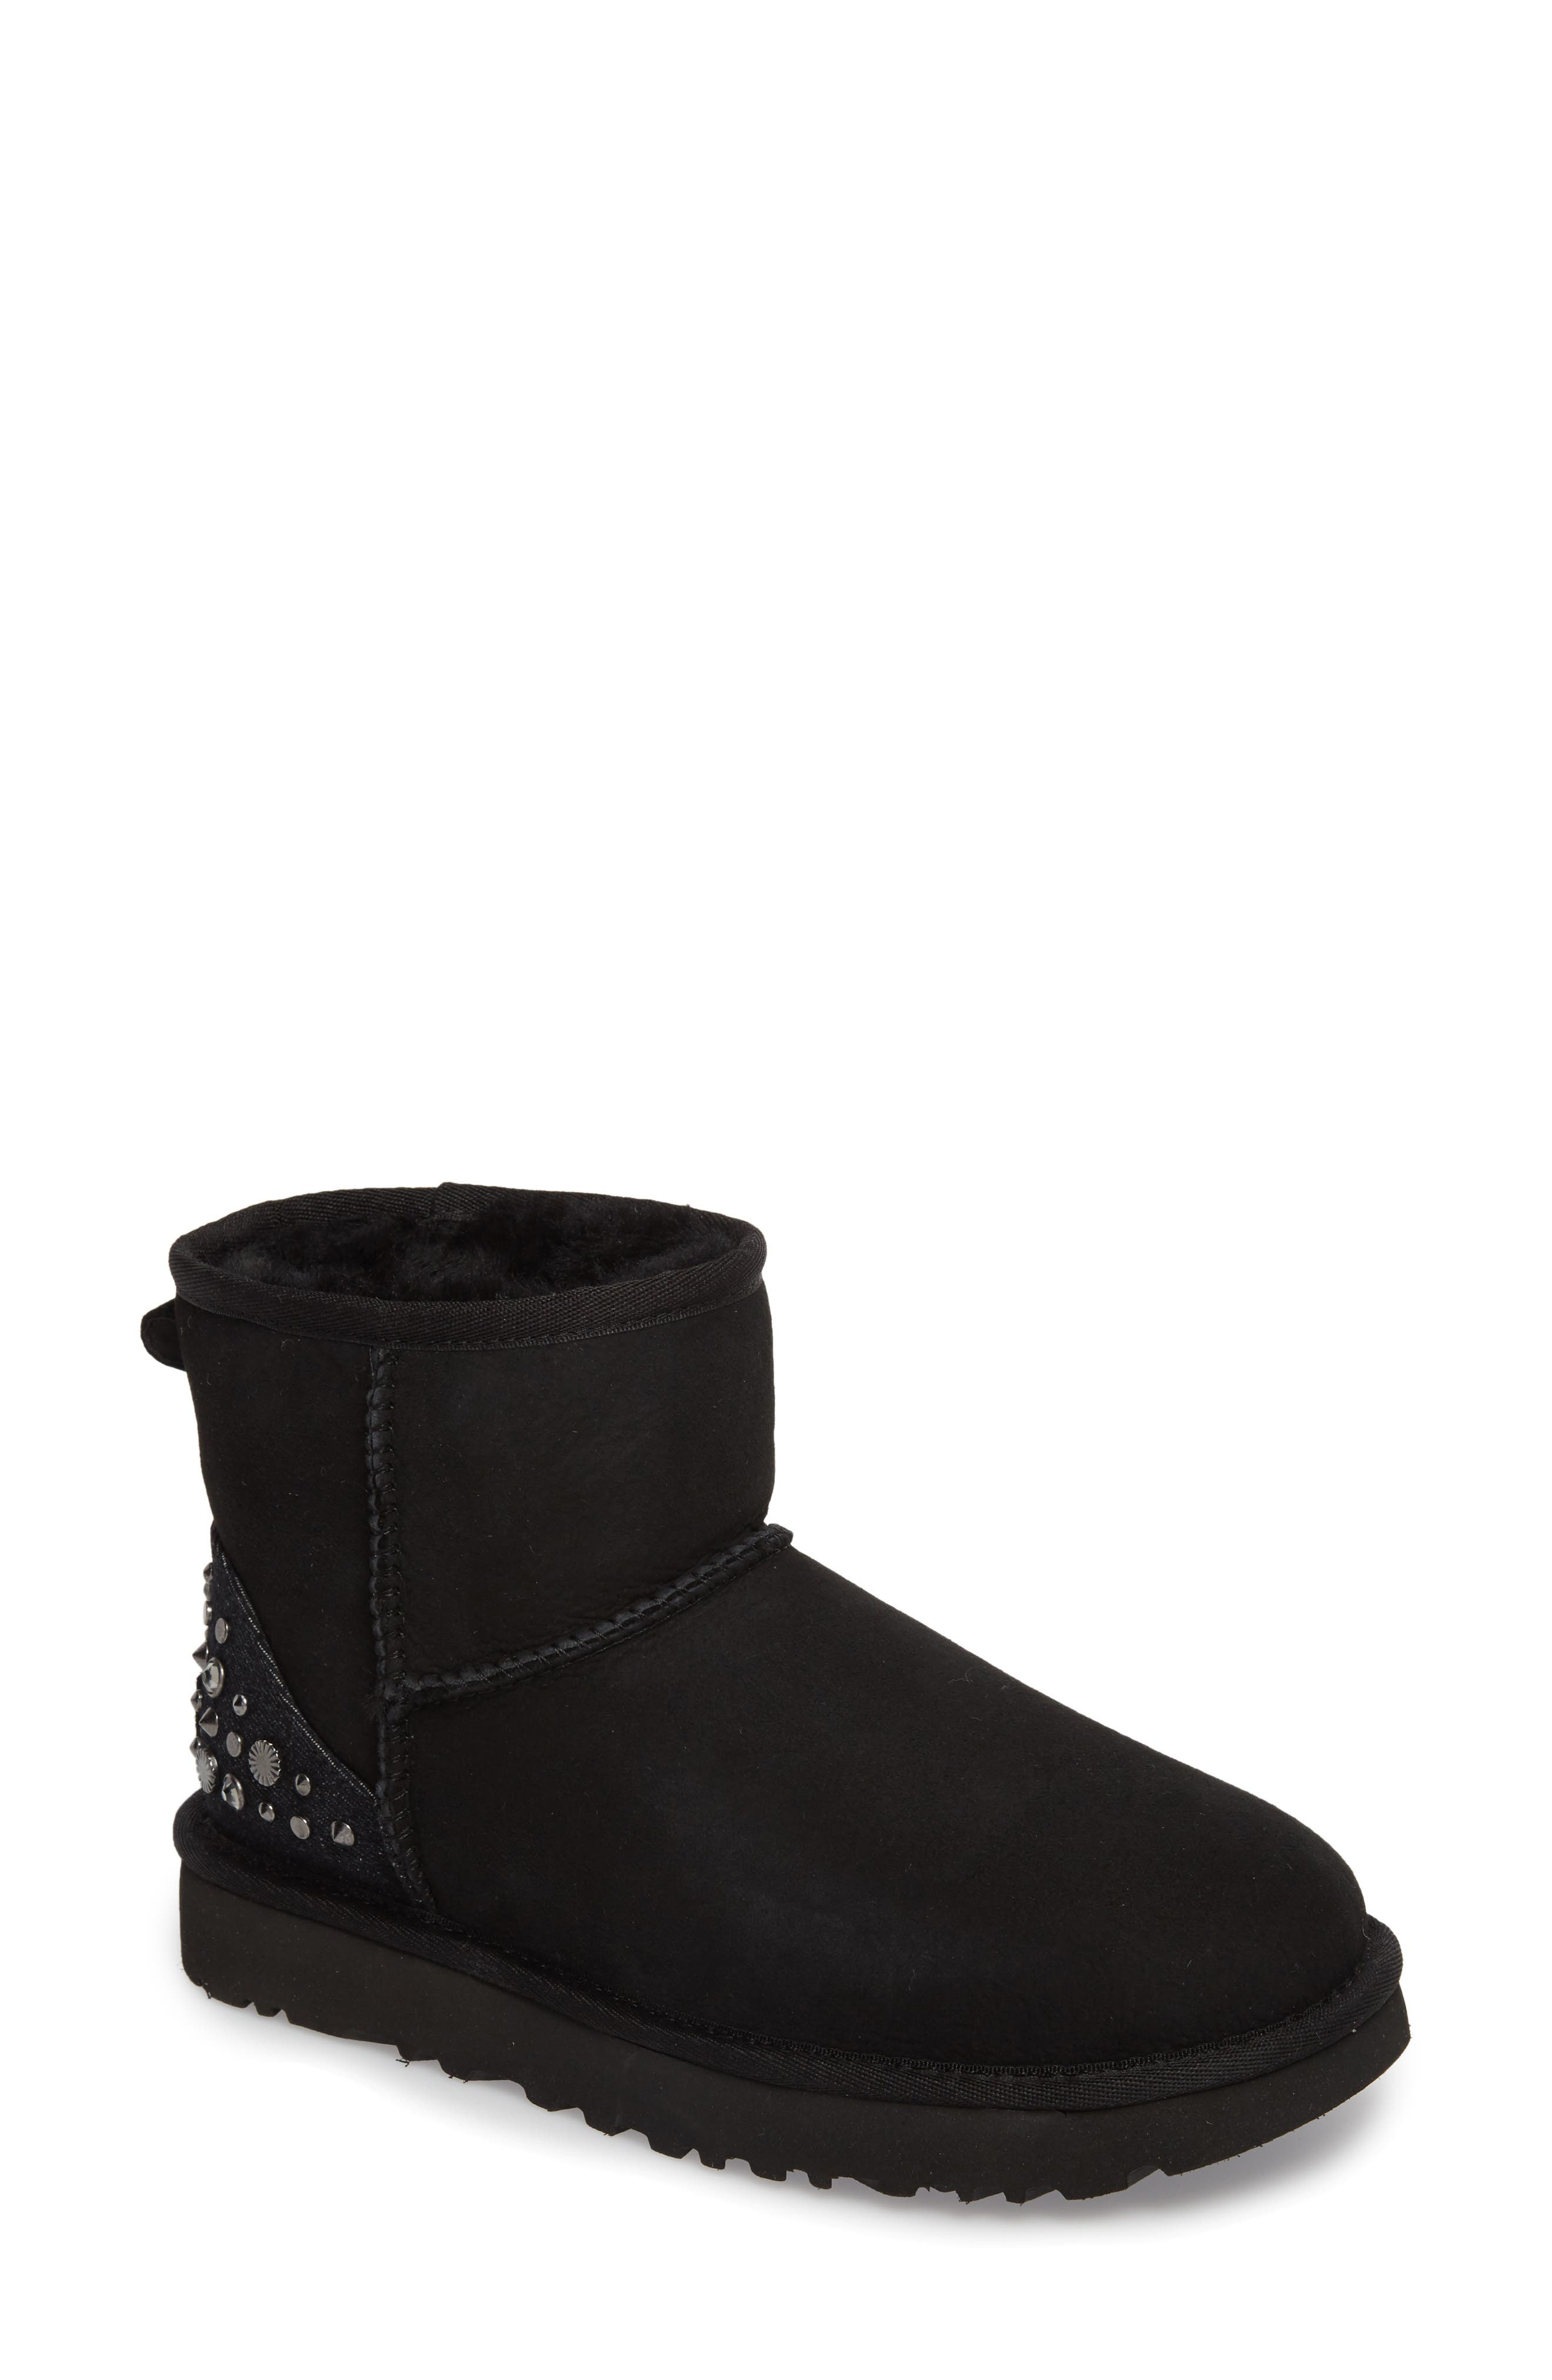 Main Image - UGG® Studded Mini Genuine Shearling Lined Boot (Women)